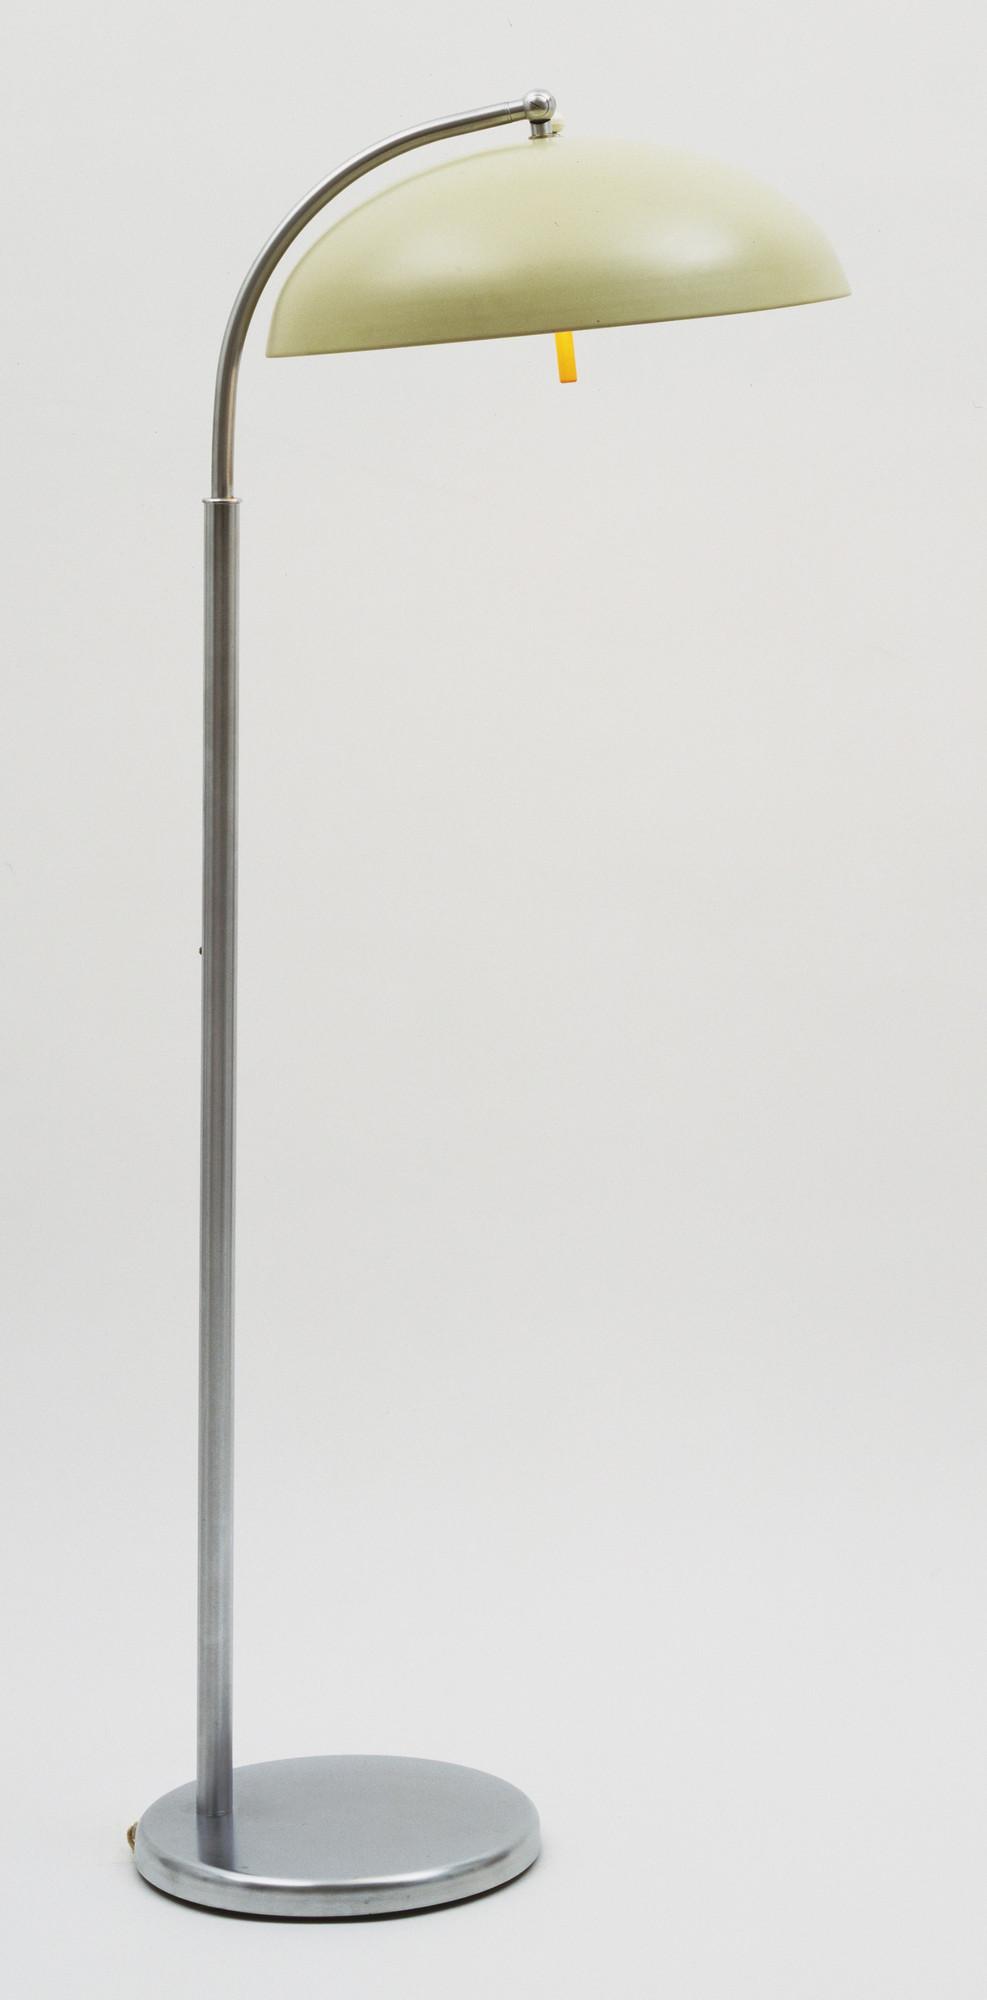 Walter Von Nessen Floor Lamp C 1927 35 Moma